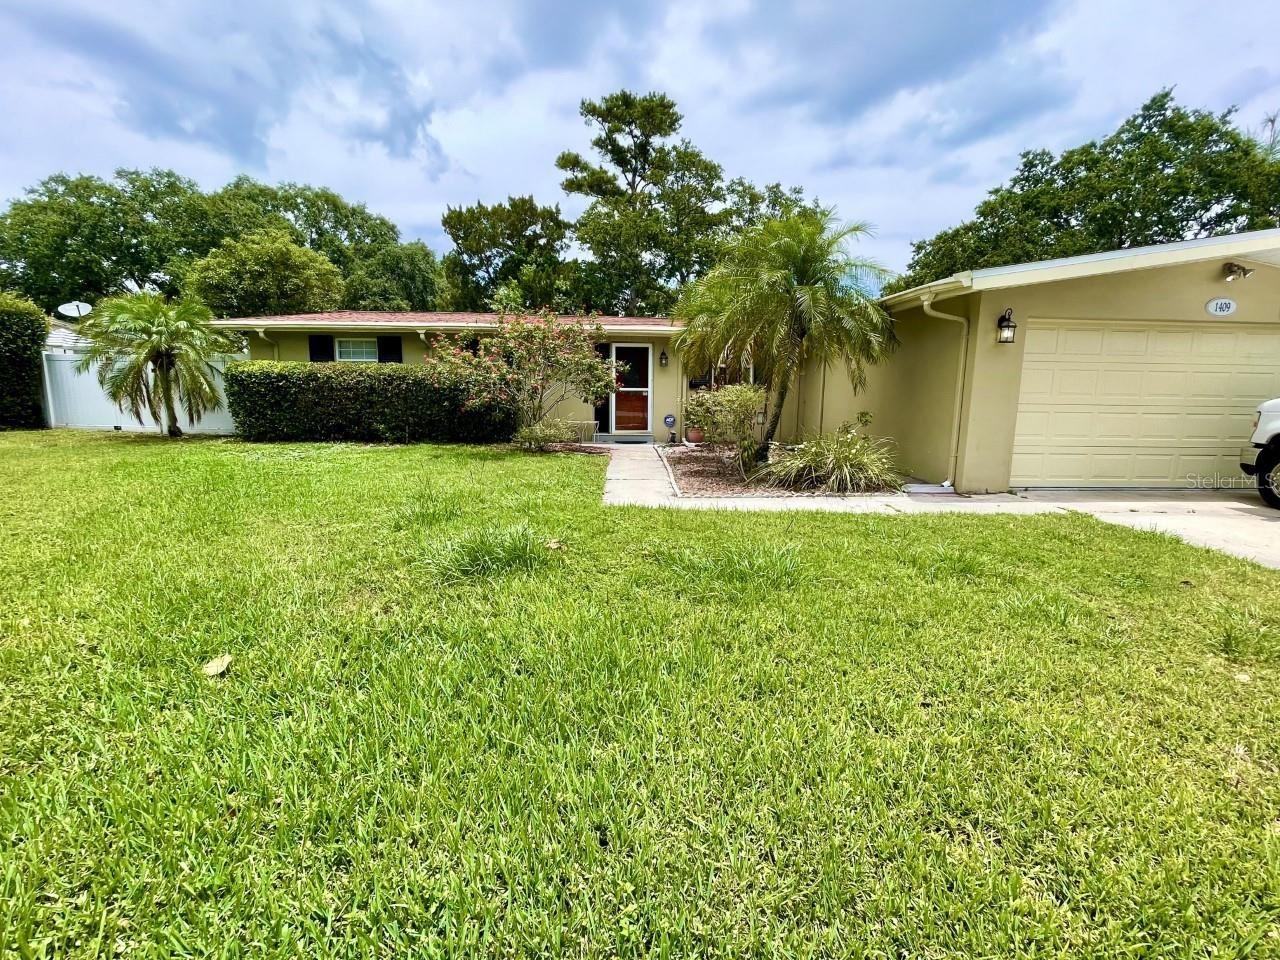 1409 DRUM STREET, Clearwater, FL 33764 - #: A4503306